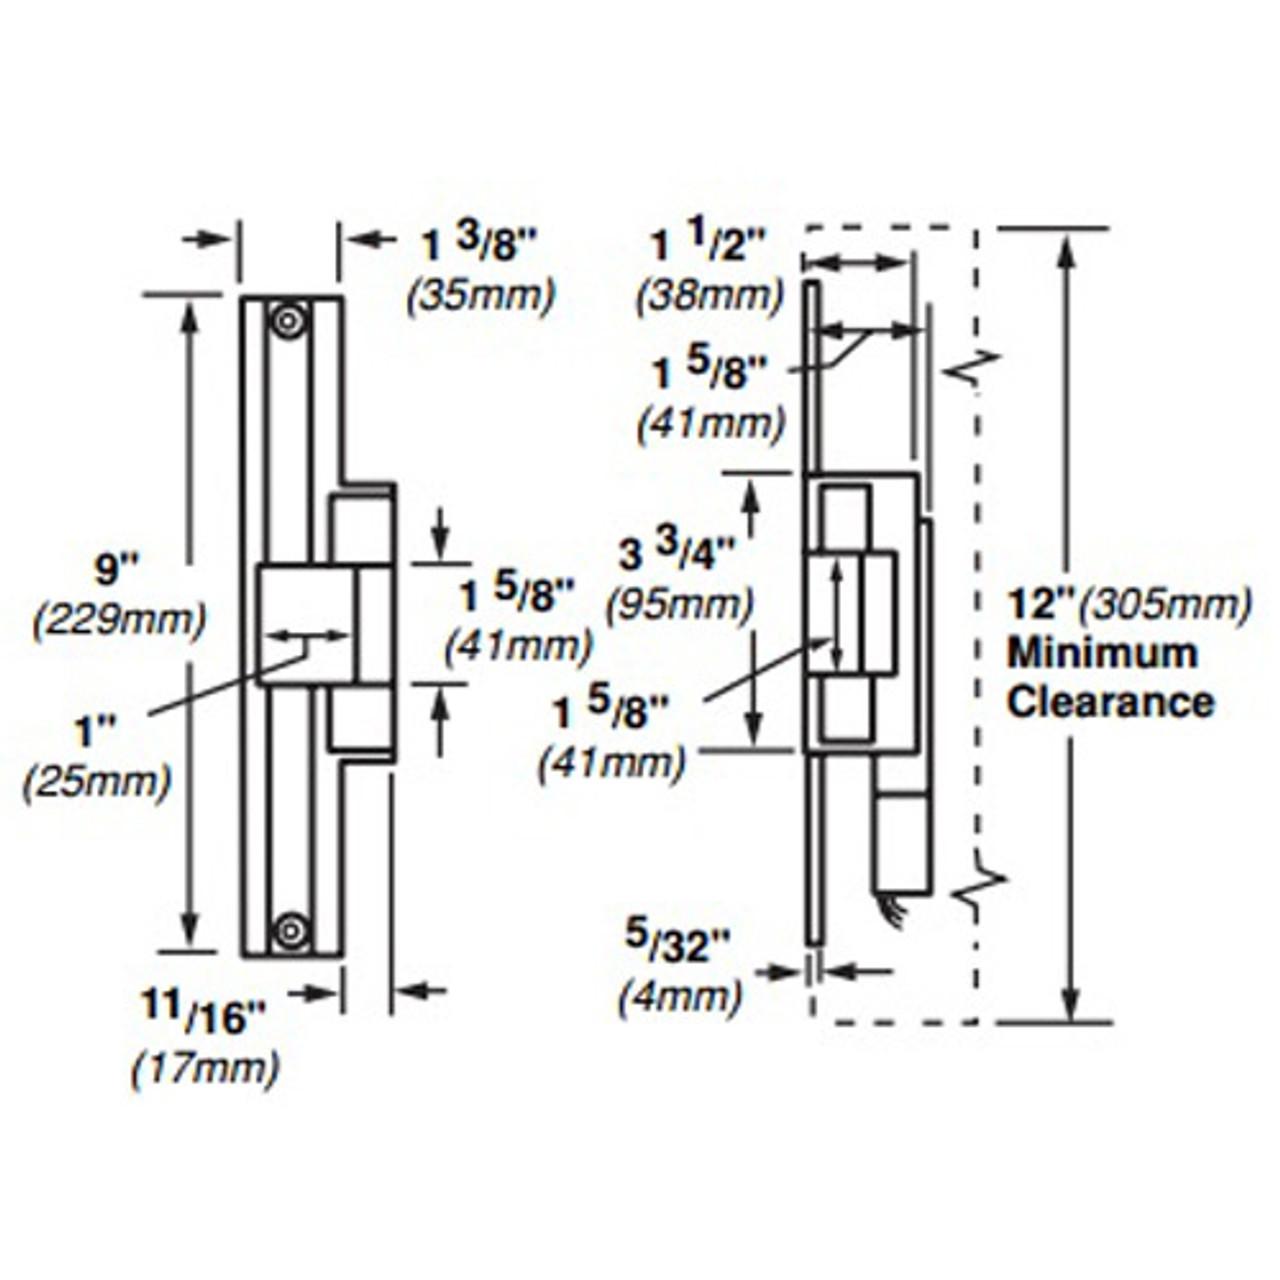 6224AL-FS-24VDC-US3 Von Duprin Electric Strike for Mortise or Cylindrical Locksets in Bright Brass Finish